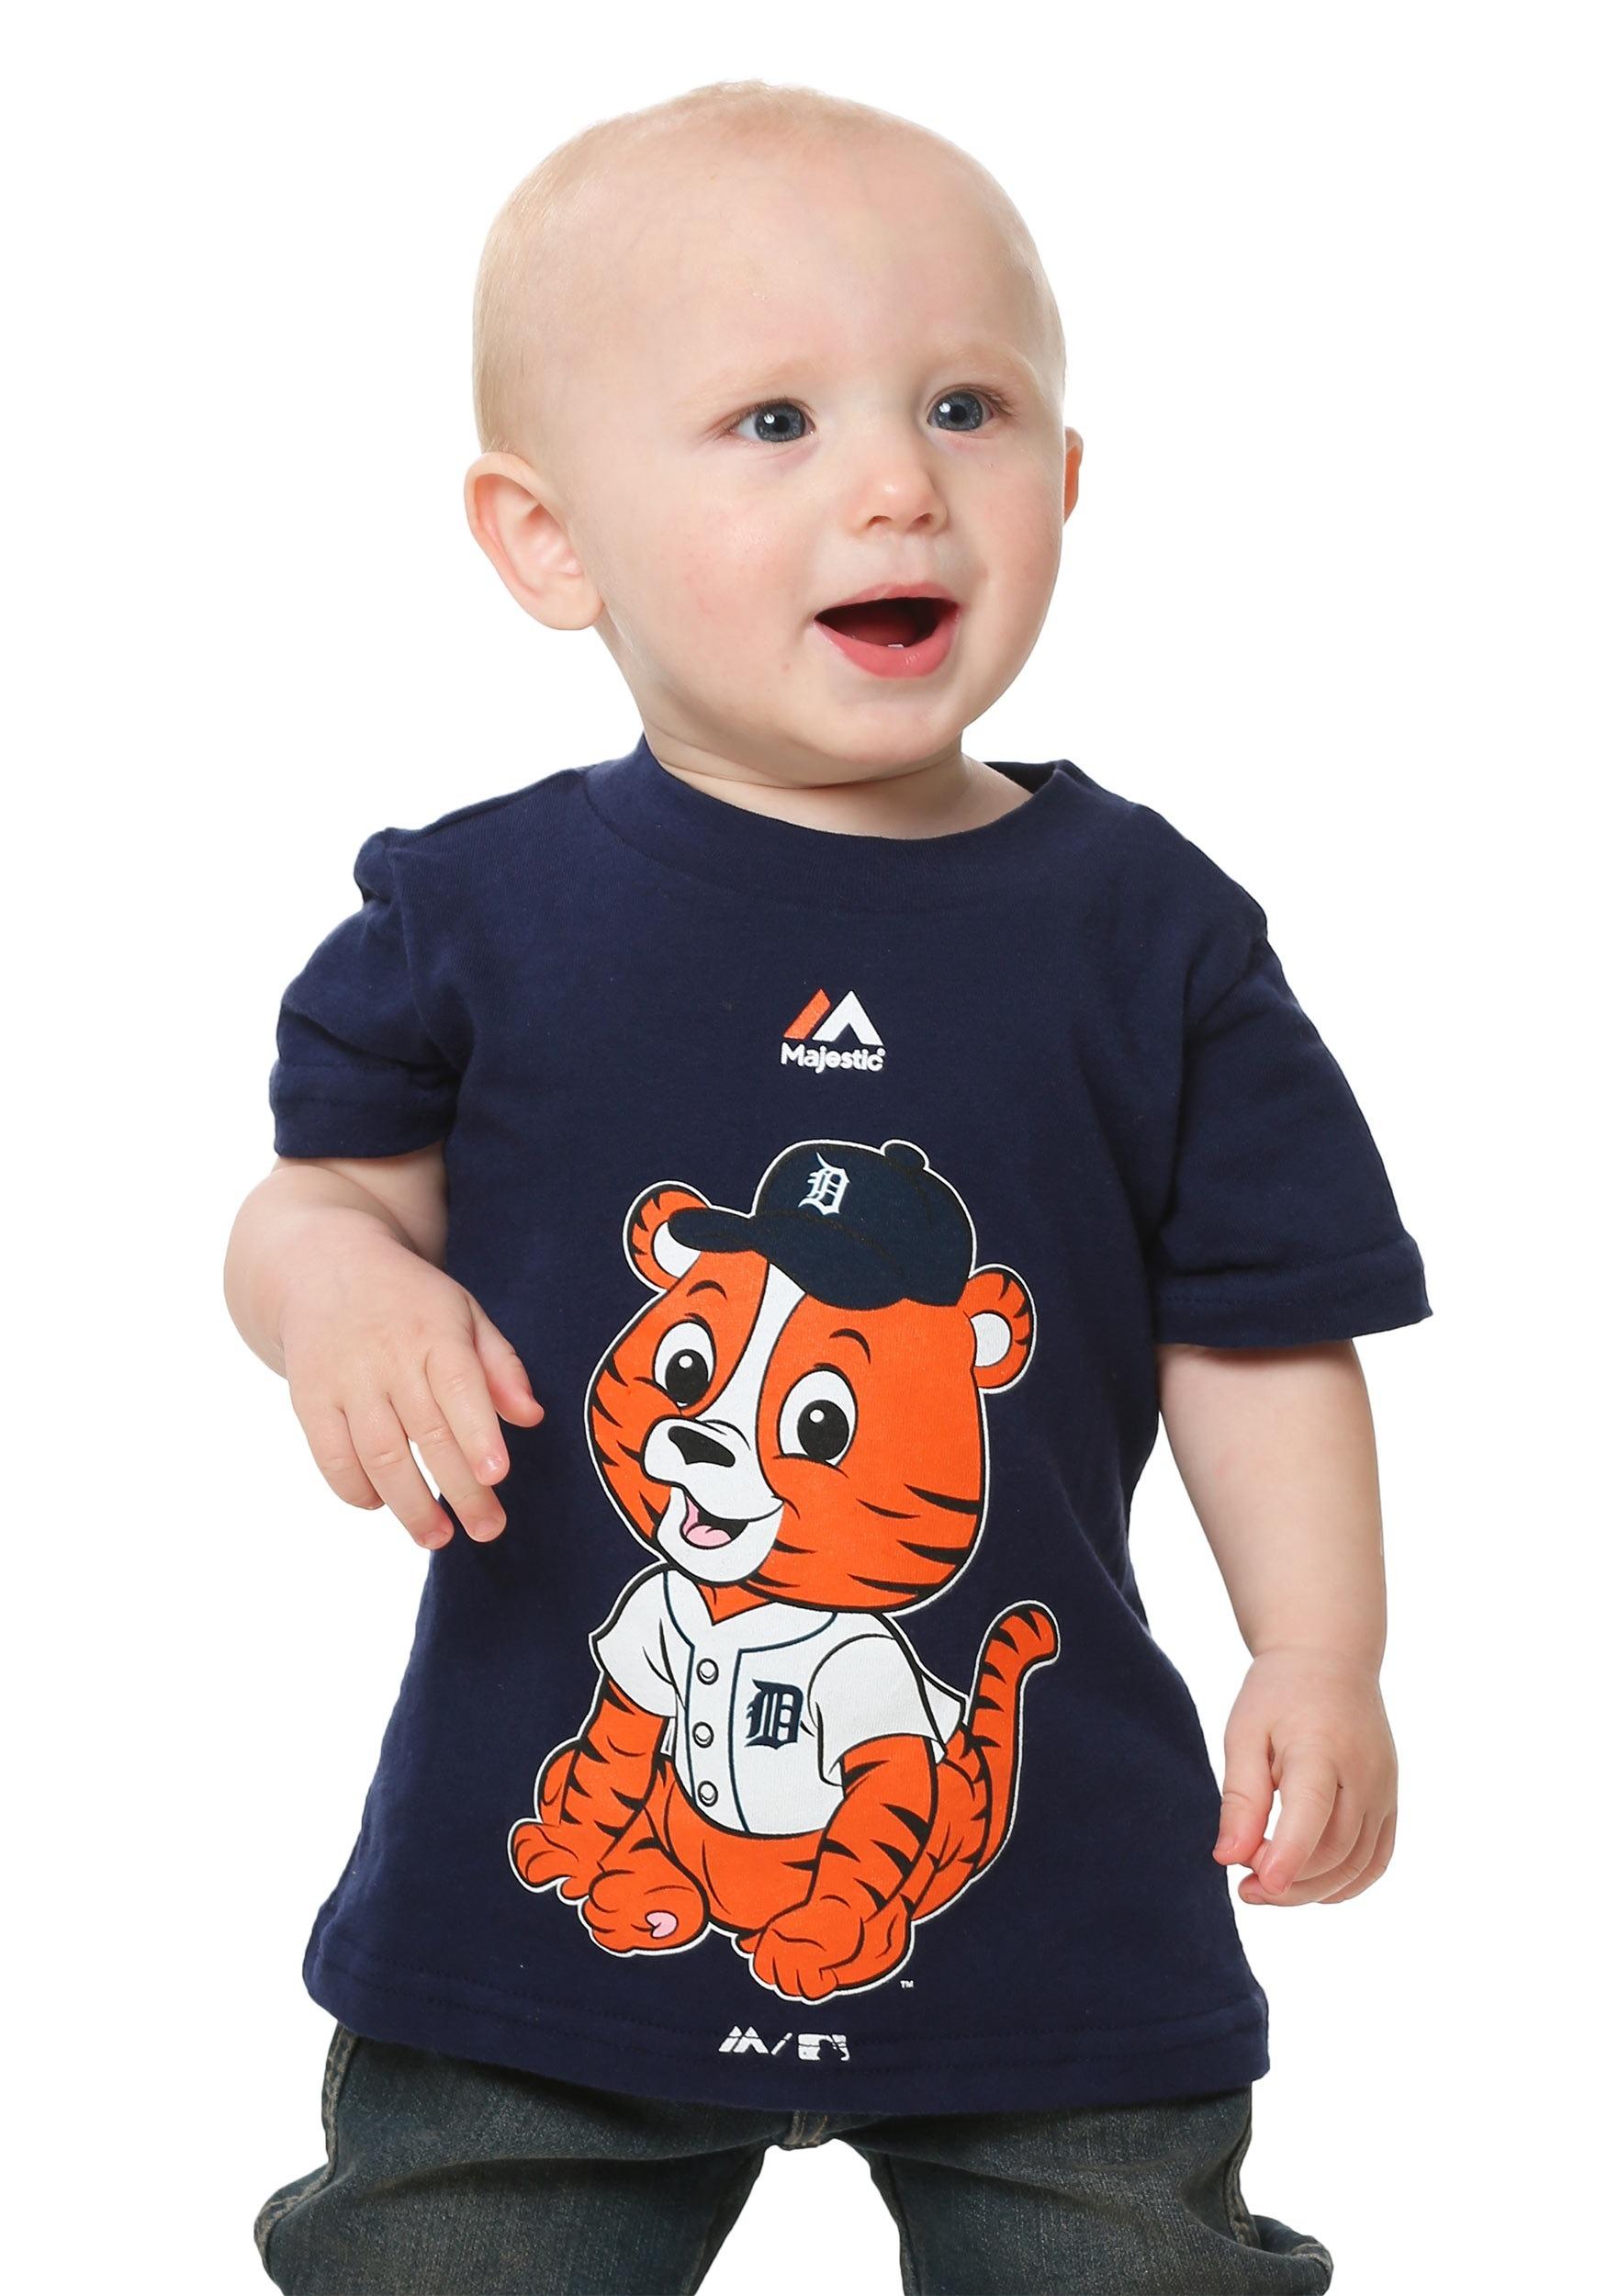 Detroit Tigers Baby Mascot Infant T Shirt